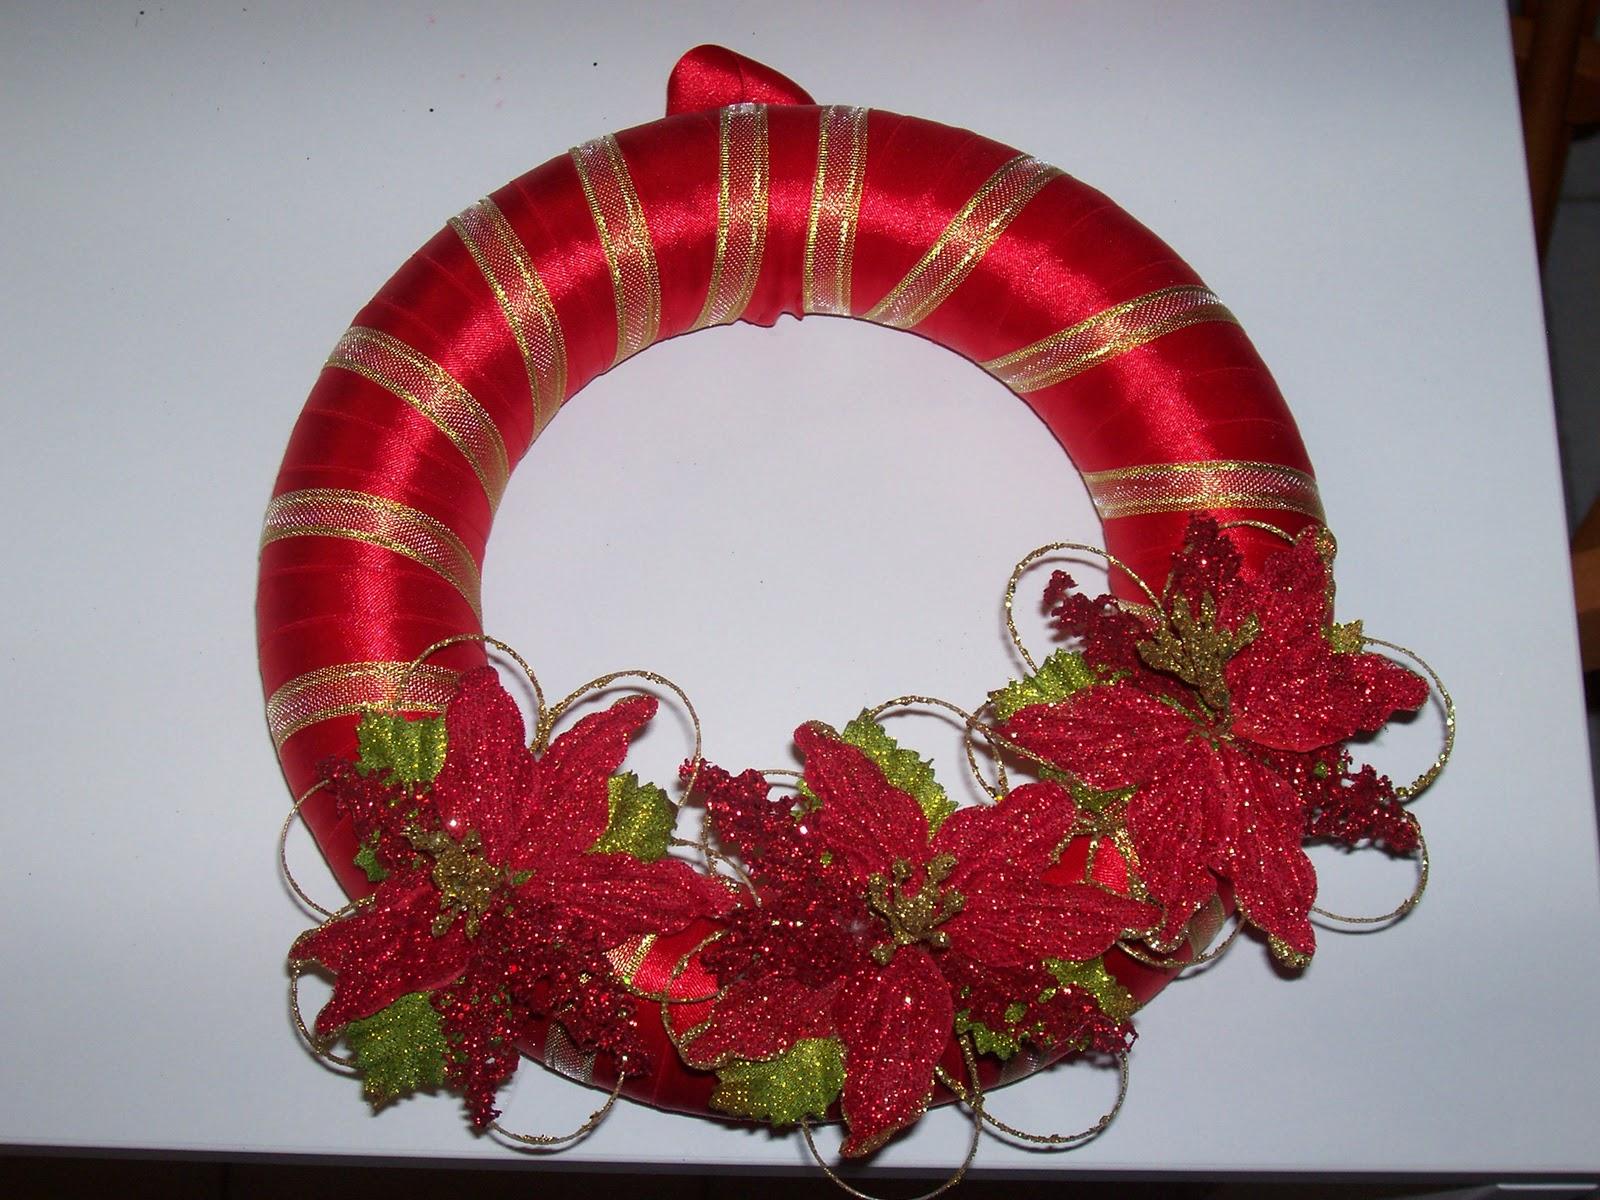 Mille idee ghirlande natalizie - Ghirlanda di natale per porta ...